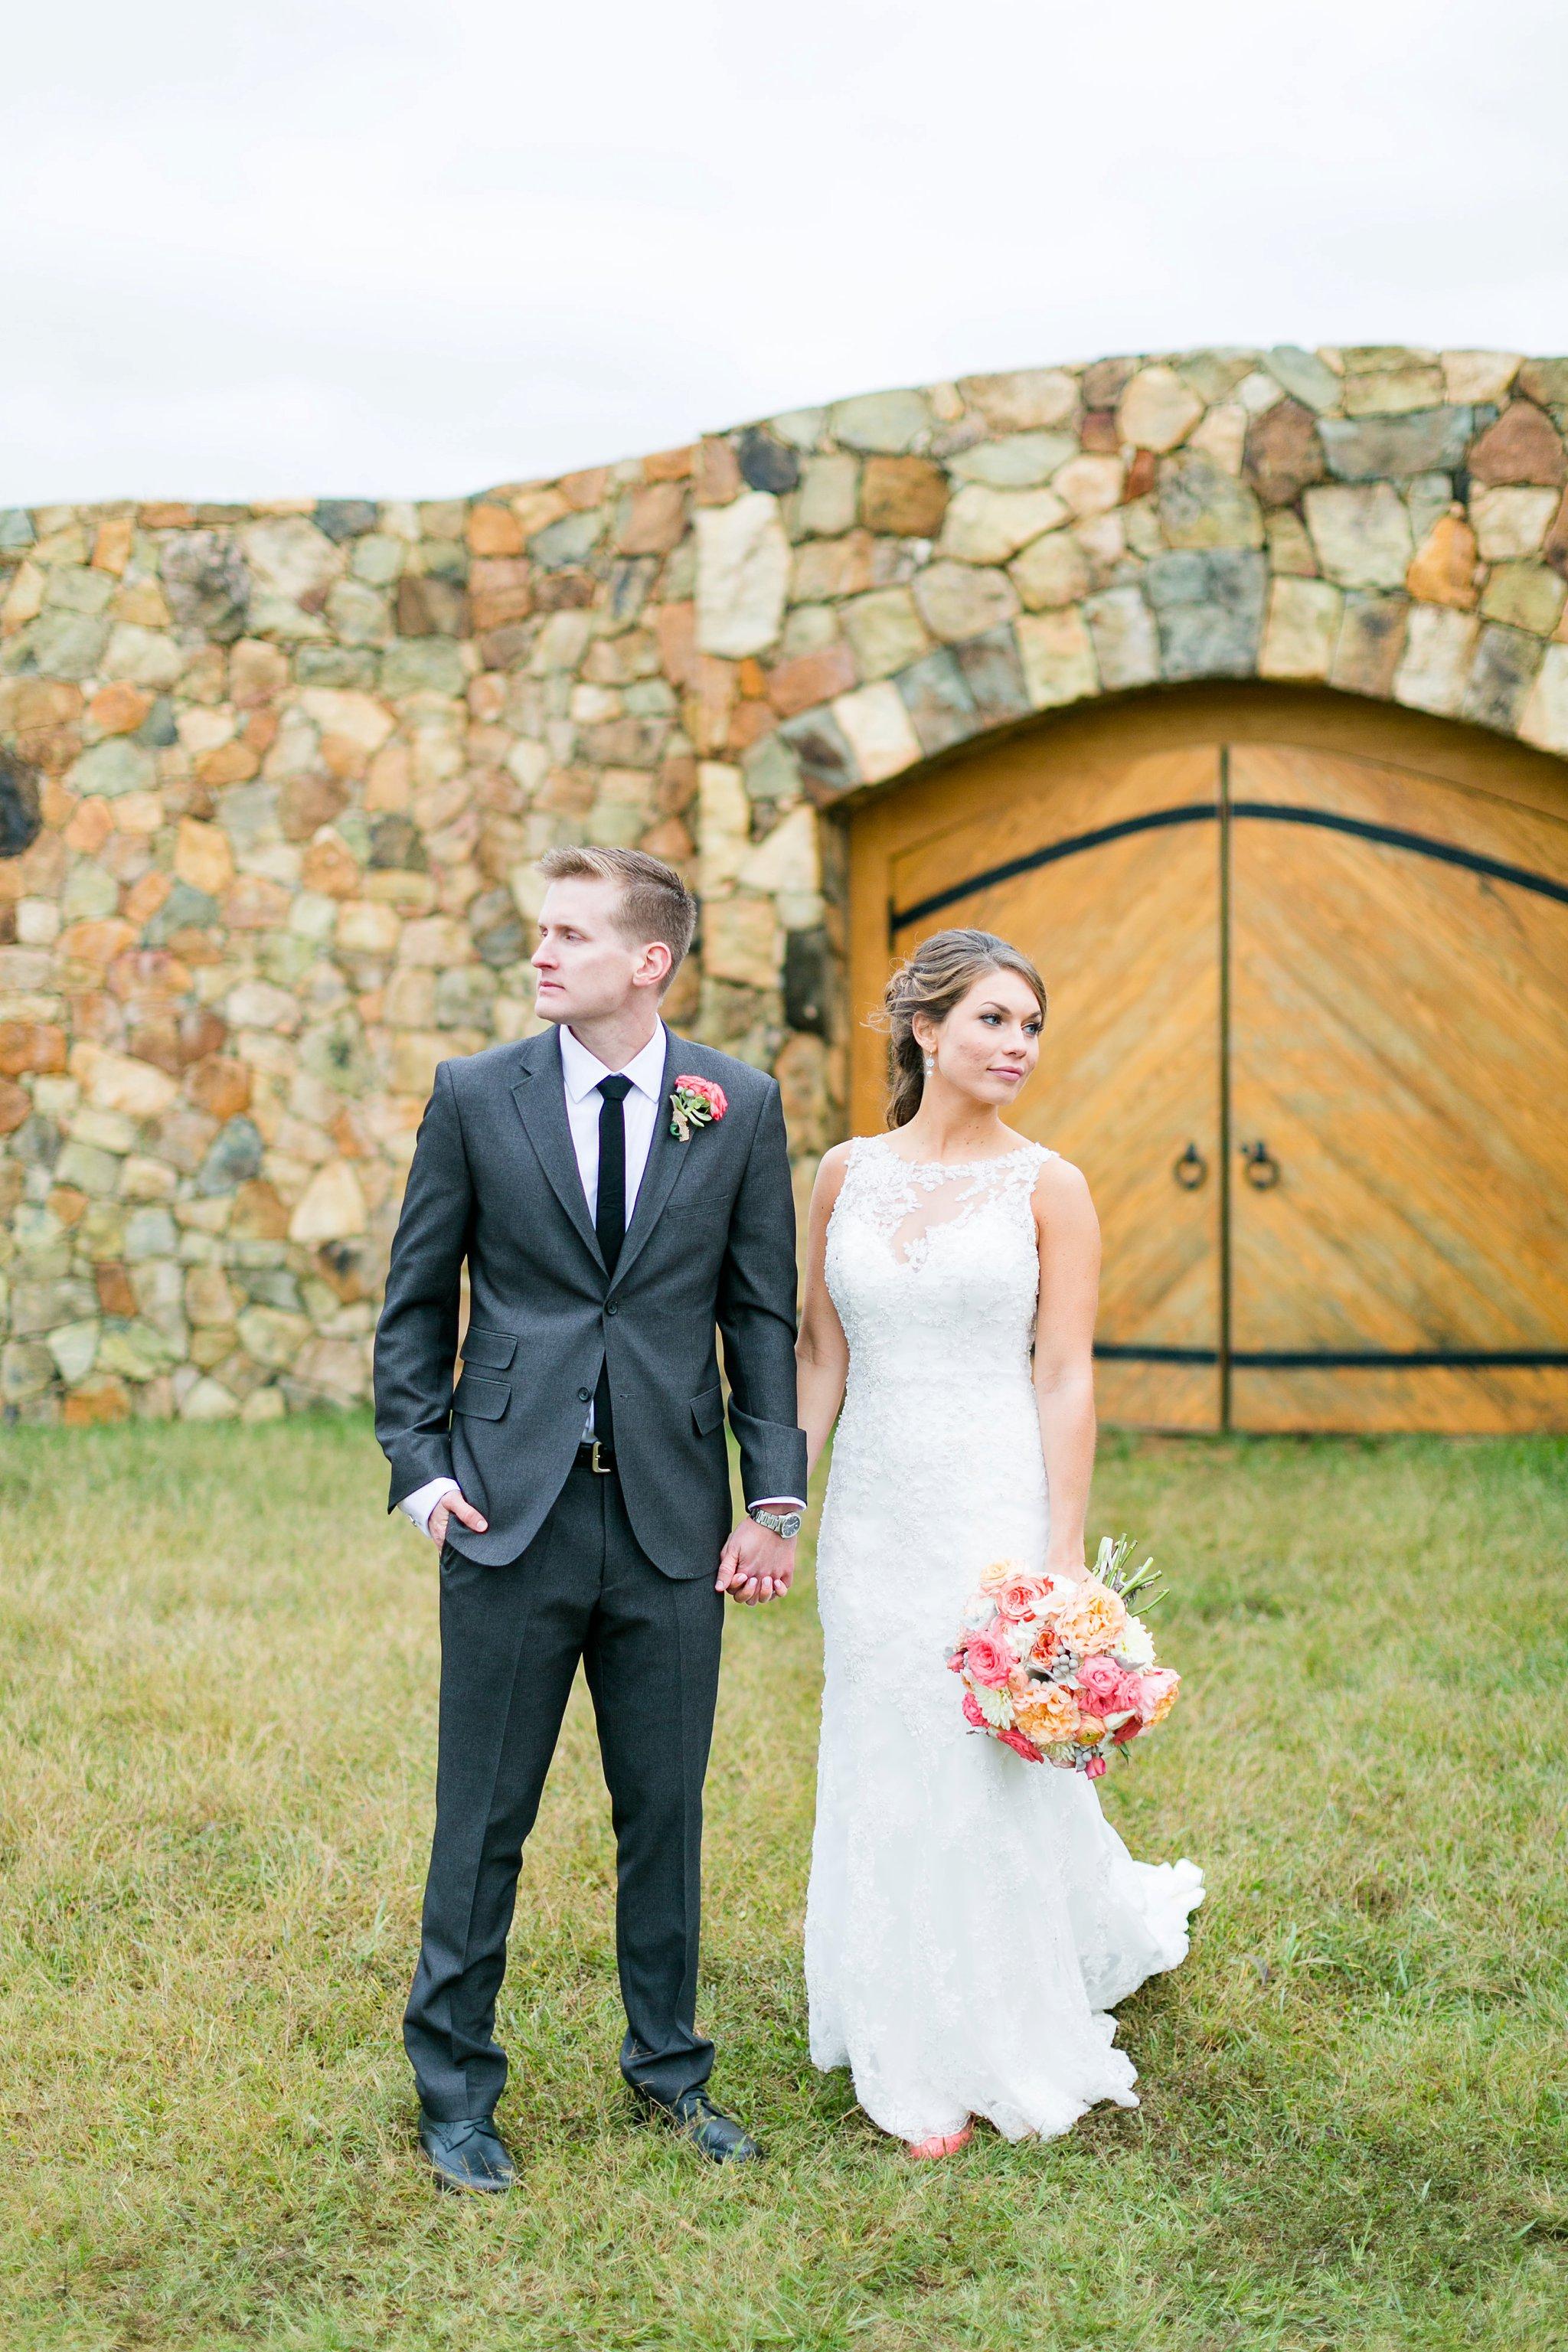 Stone Tower Winery Wedding Photos Virginia Wedding Photographer Megan Kelsey Photography Sam & Angela-261.jpg